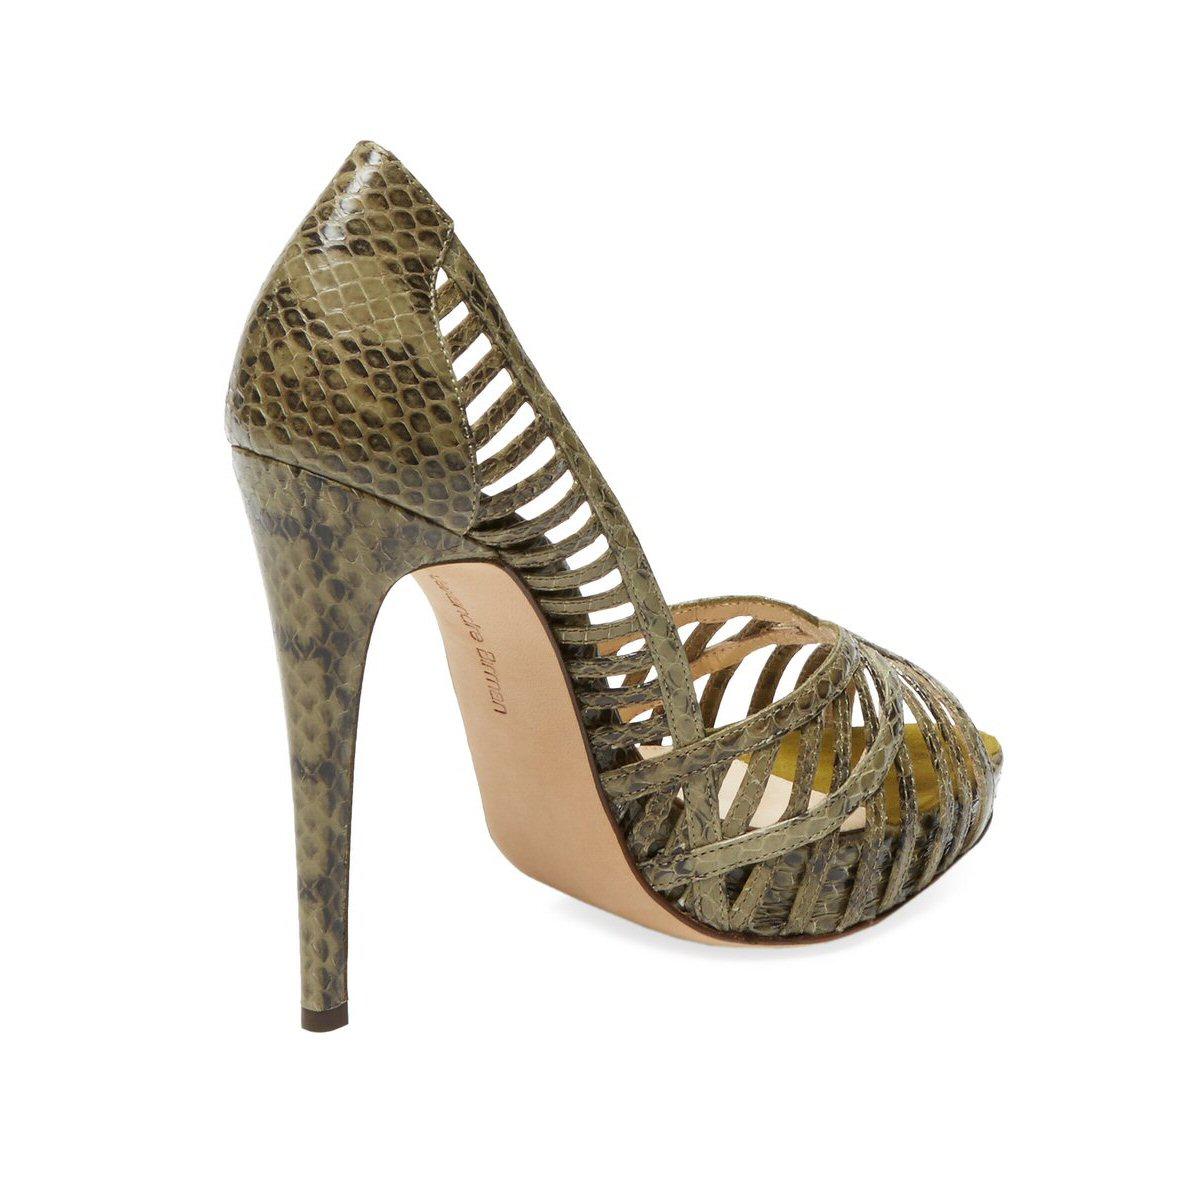 Birman Snakeskin Sandals-04